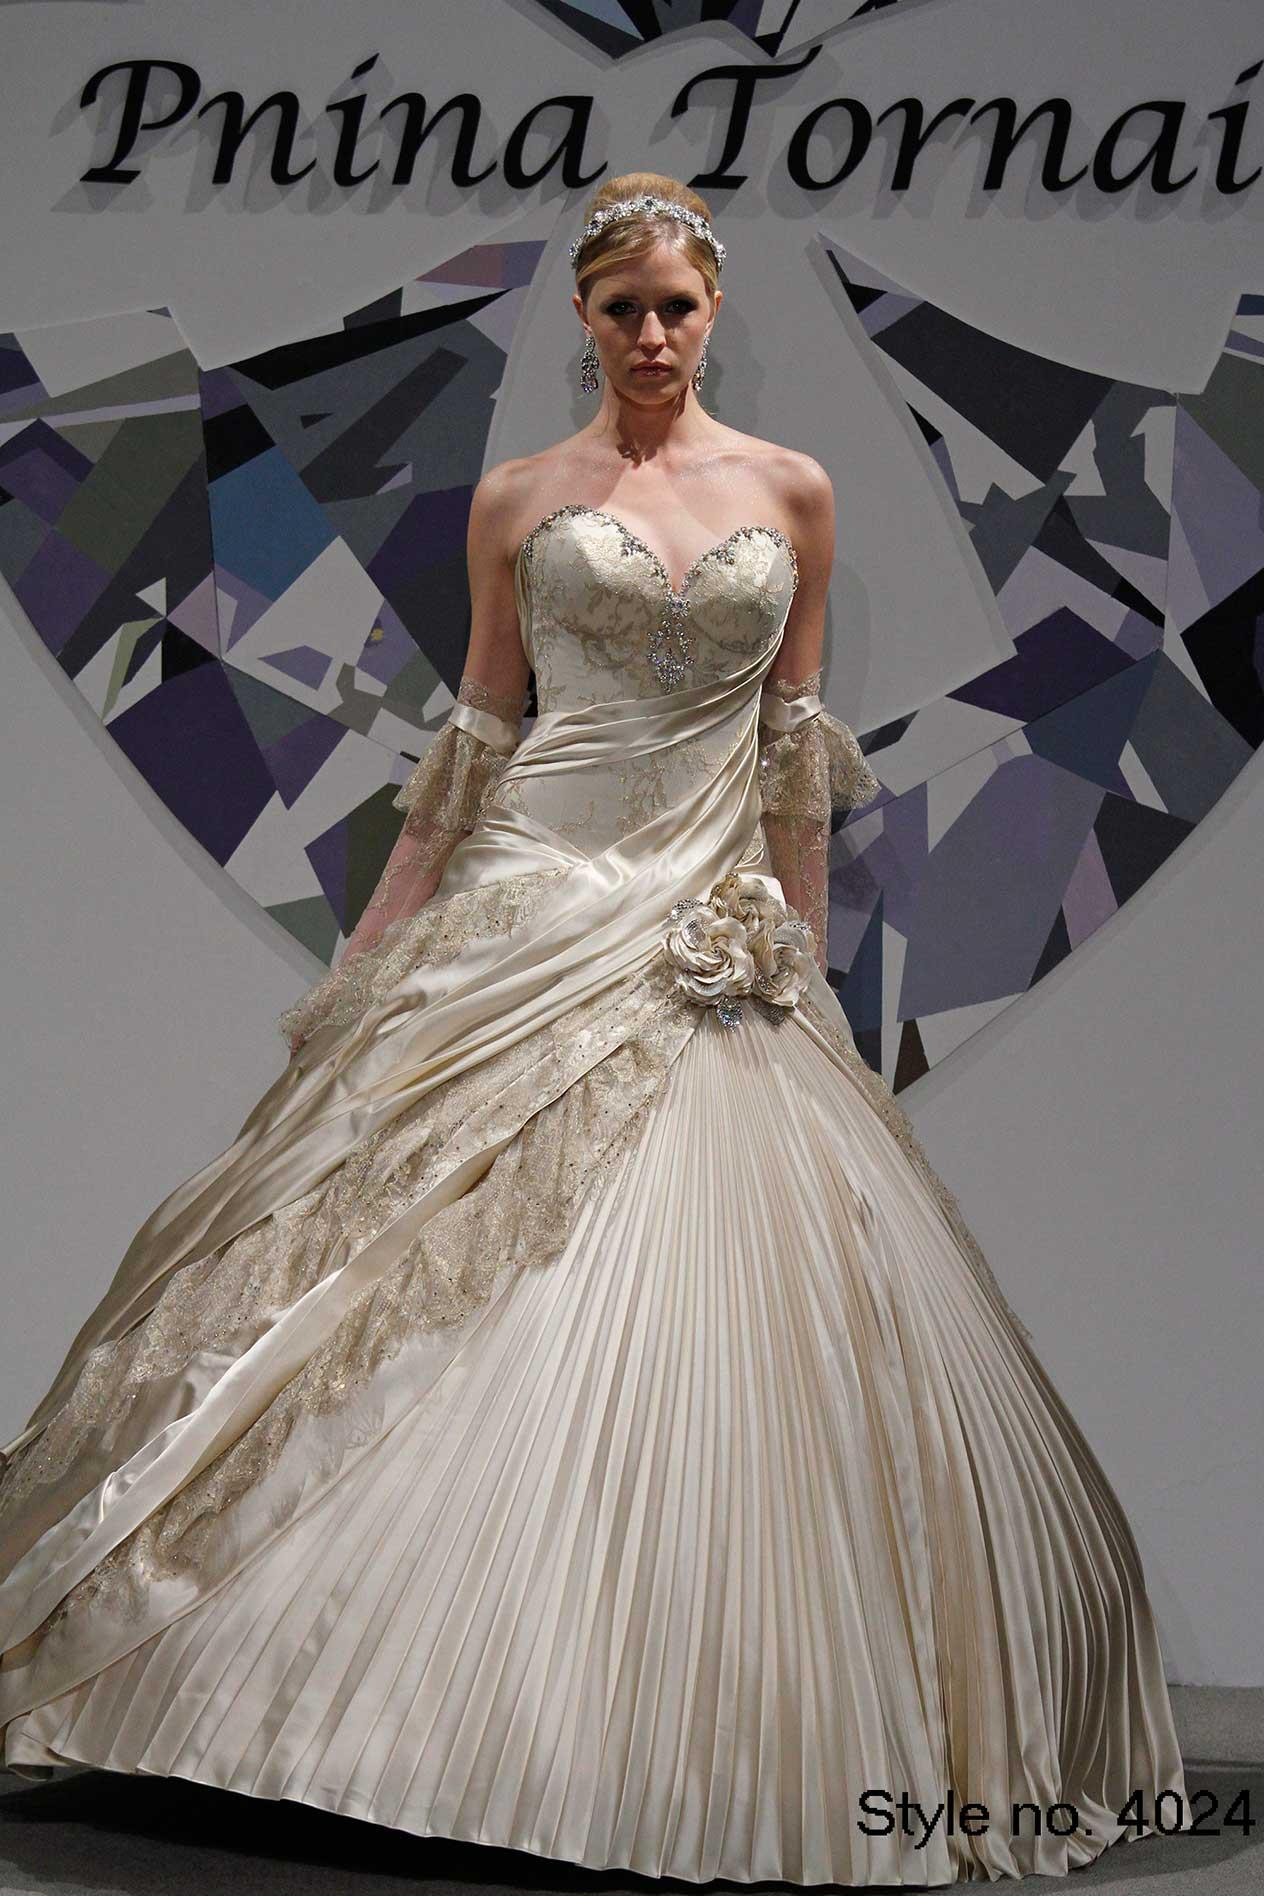 Luxury Princess Ball Gown Wedding Dresses 2015 Pnina Tornai ...